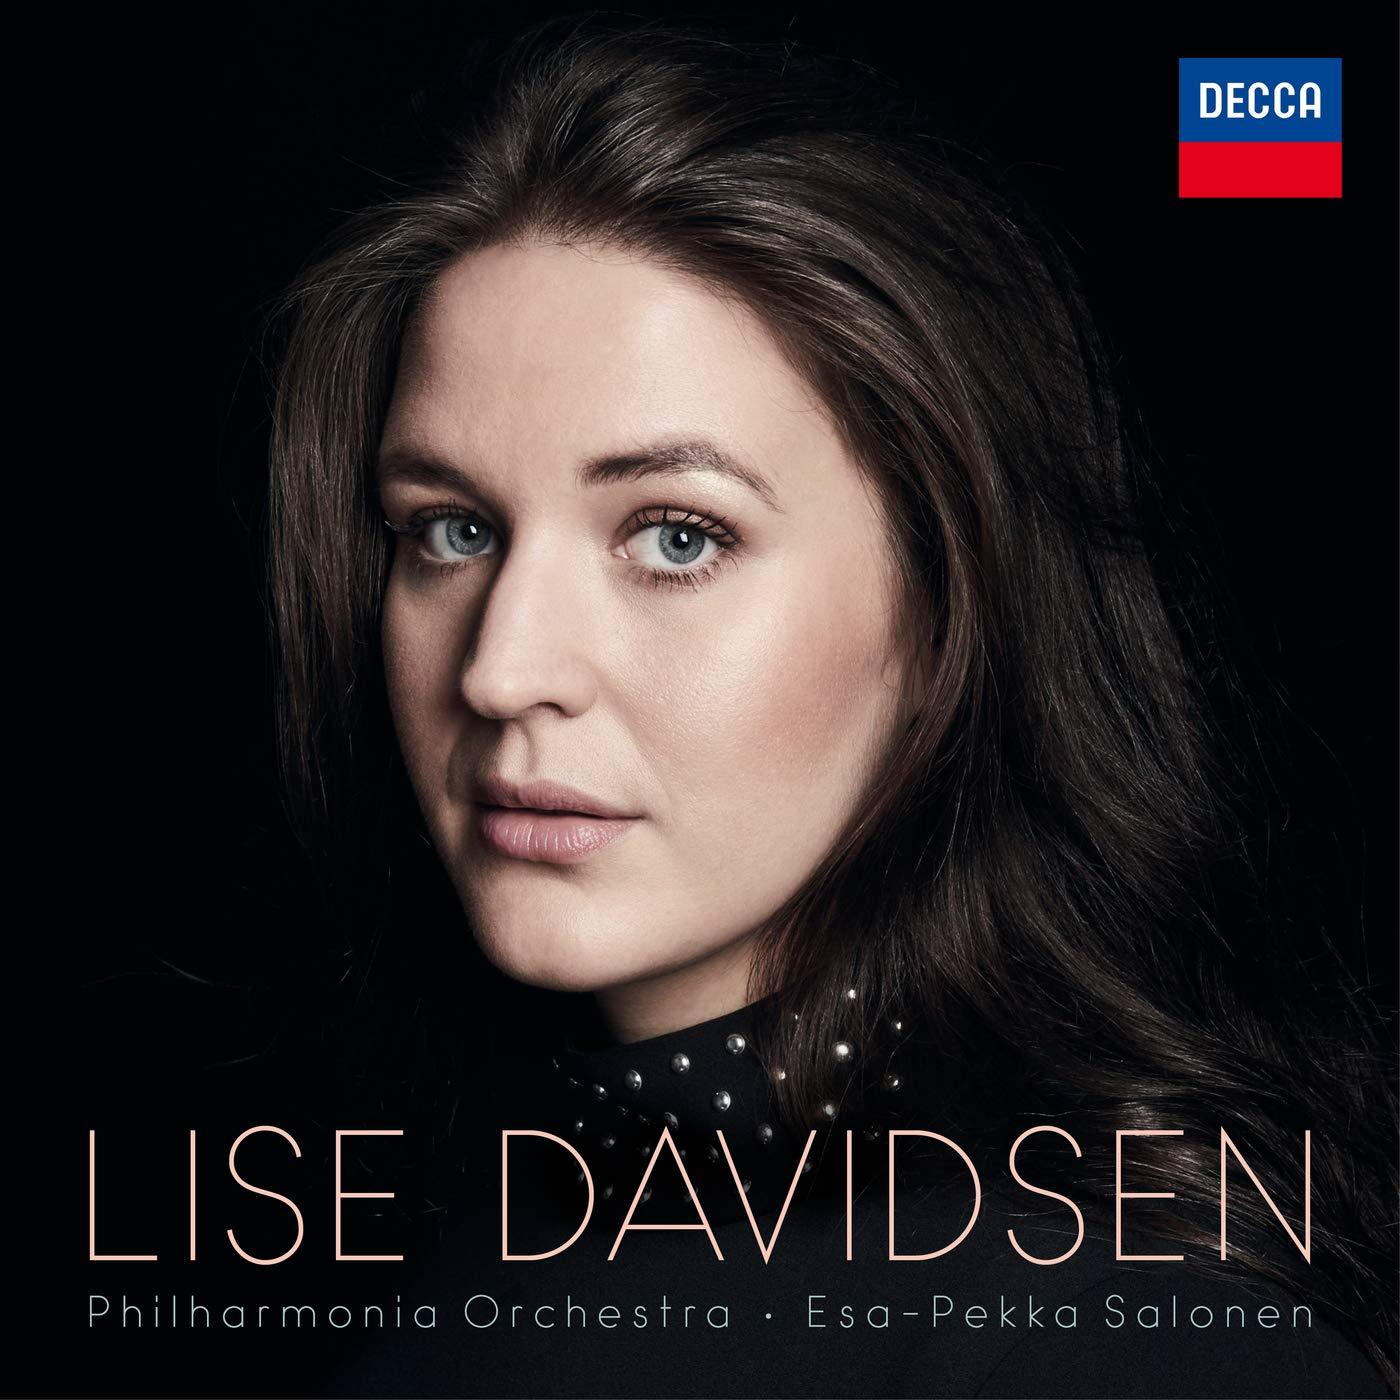 Lise Davidsen,Philarmonia Orchestra,Эса-Пекка Салонен Lise Davidsen. Strauss, R.: Four Last Songs/ Wagner: Arias From Tannhauser